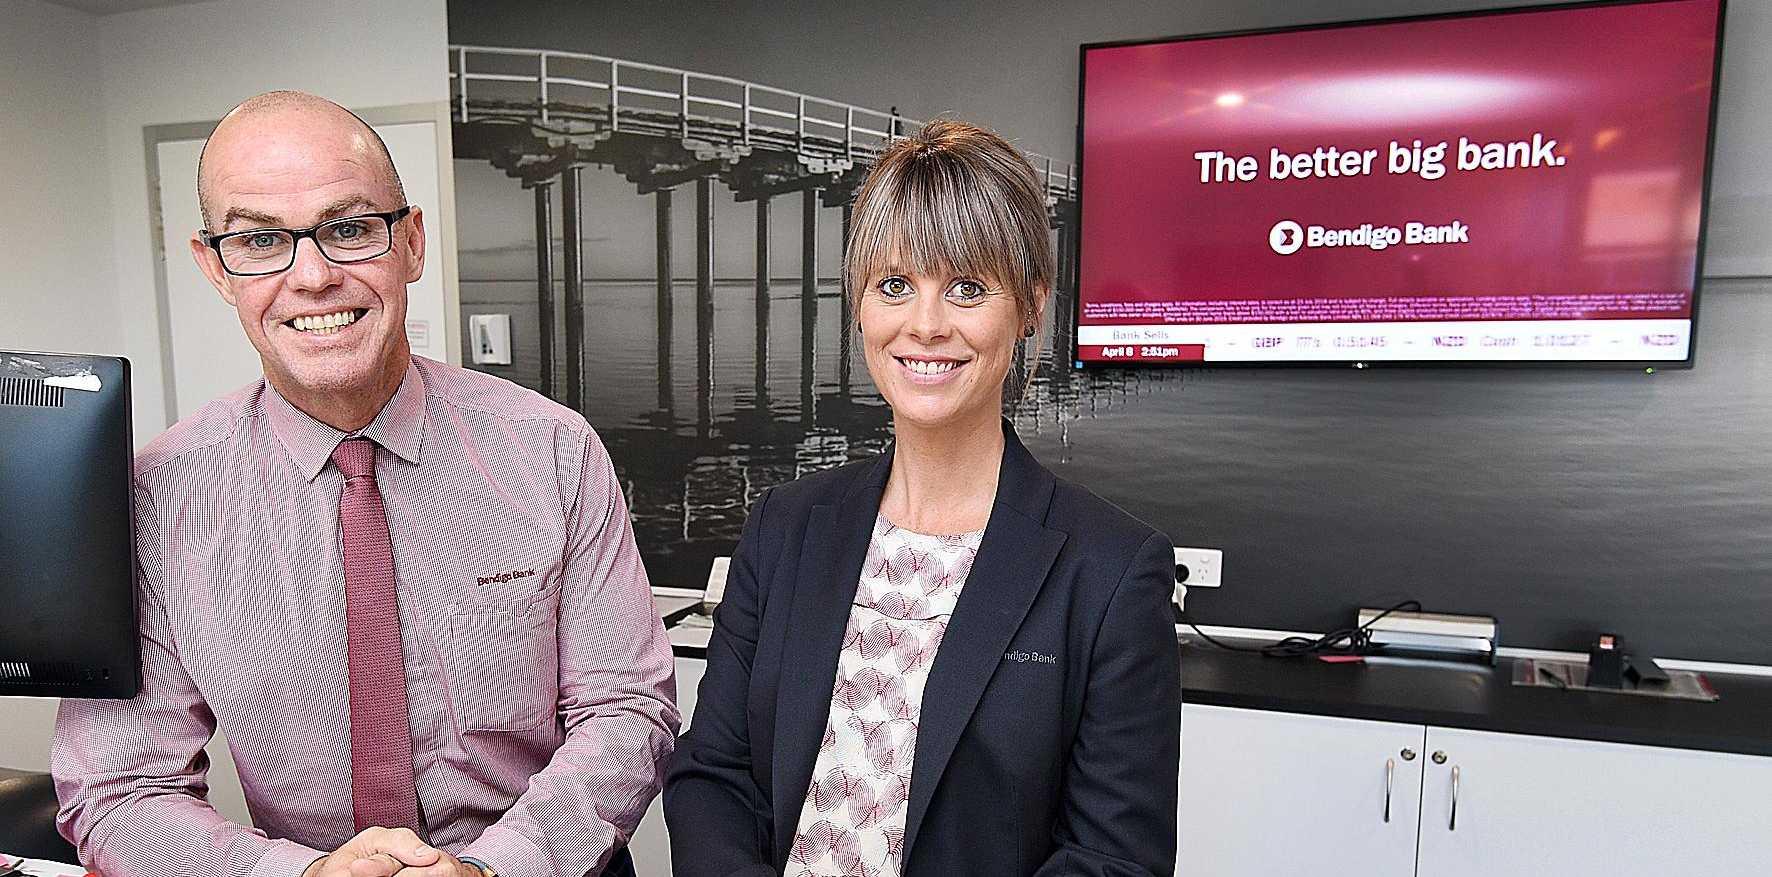 Bendigo Bank branch in Hervey Bay - branch mgr. Tim Evans and customer service officer Danni Krohn.